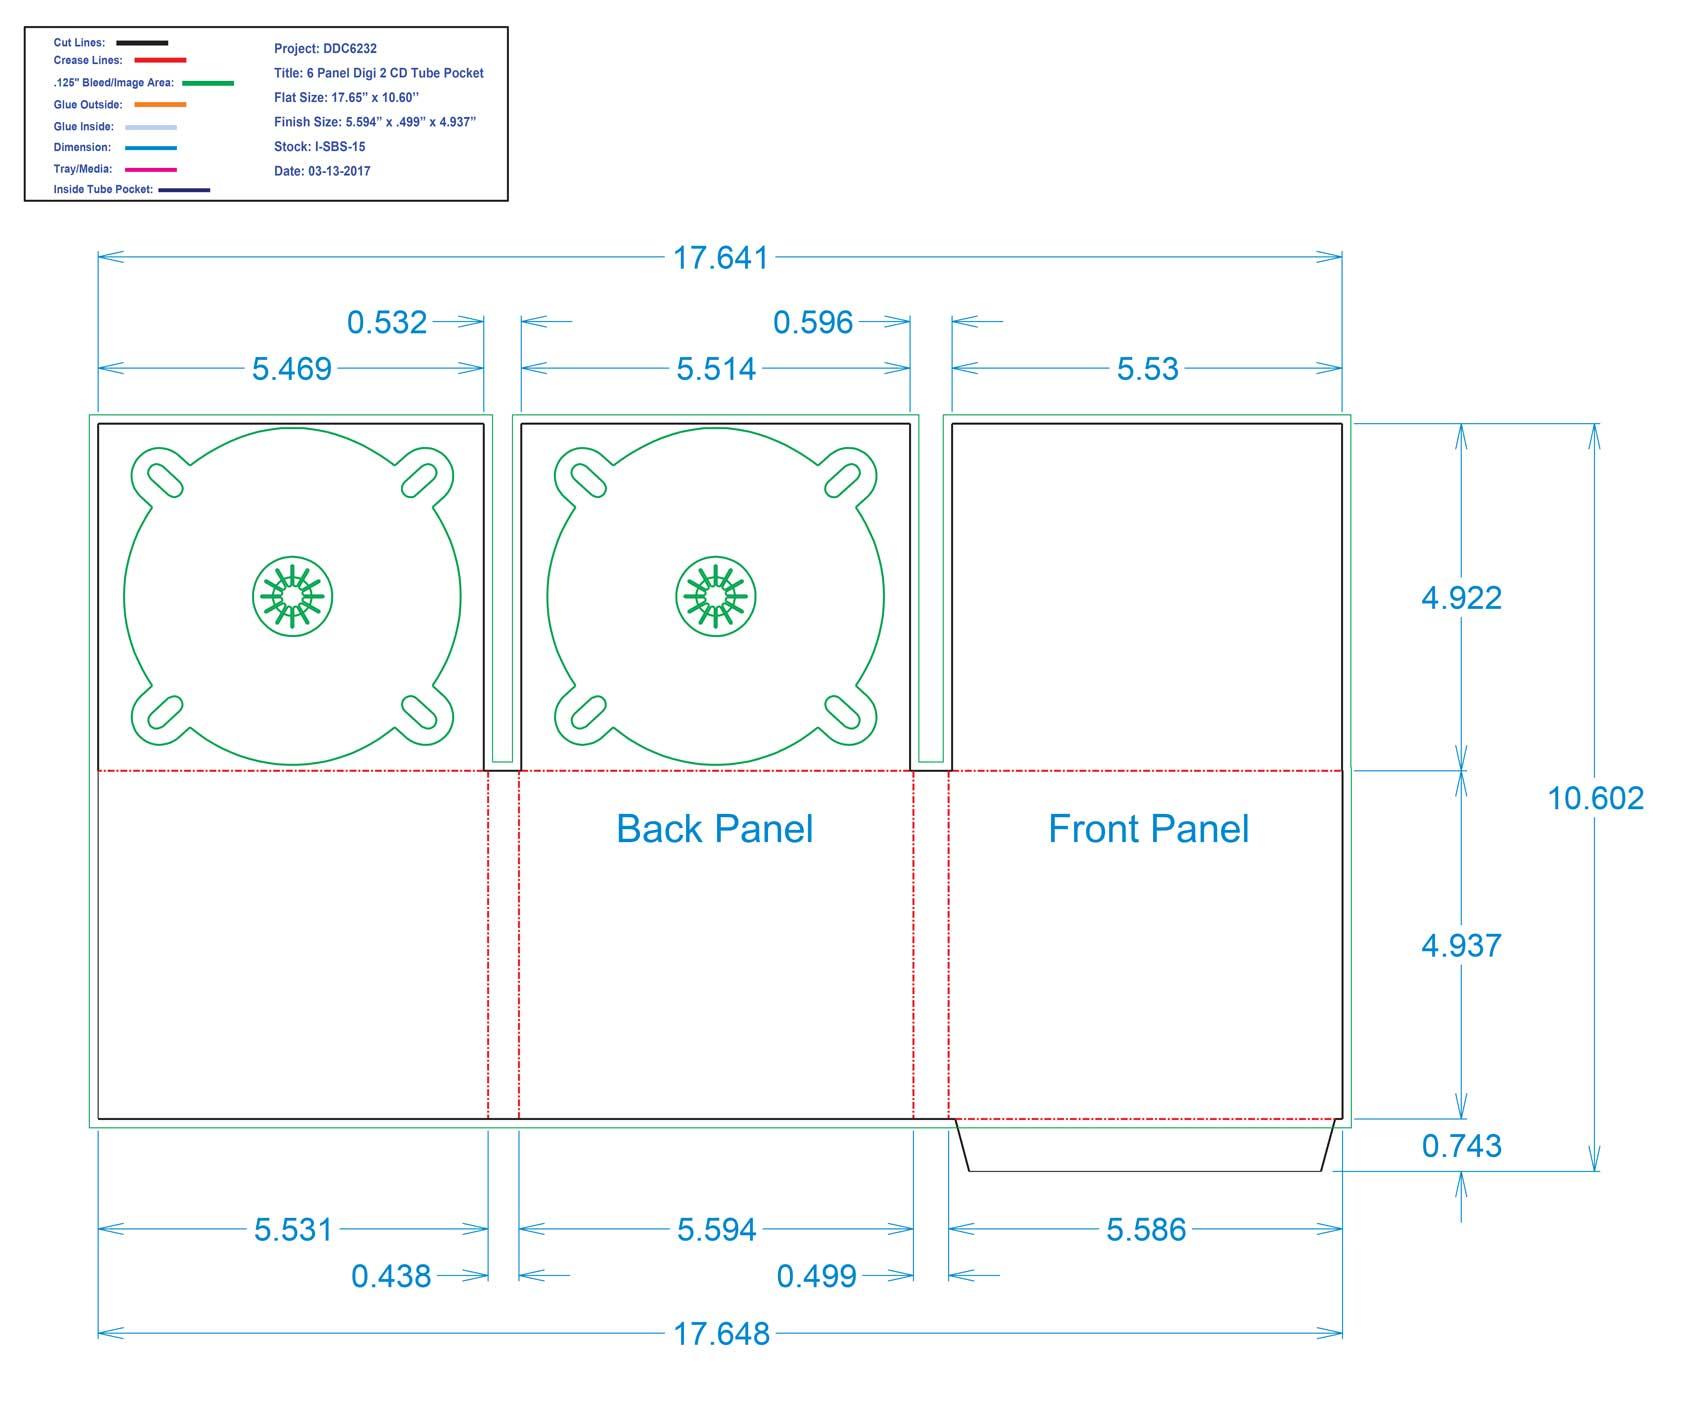 DDC6232 6 Panel Digi 2 Tray, Tube Pocket